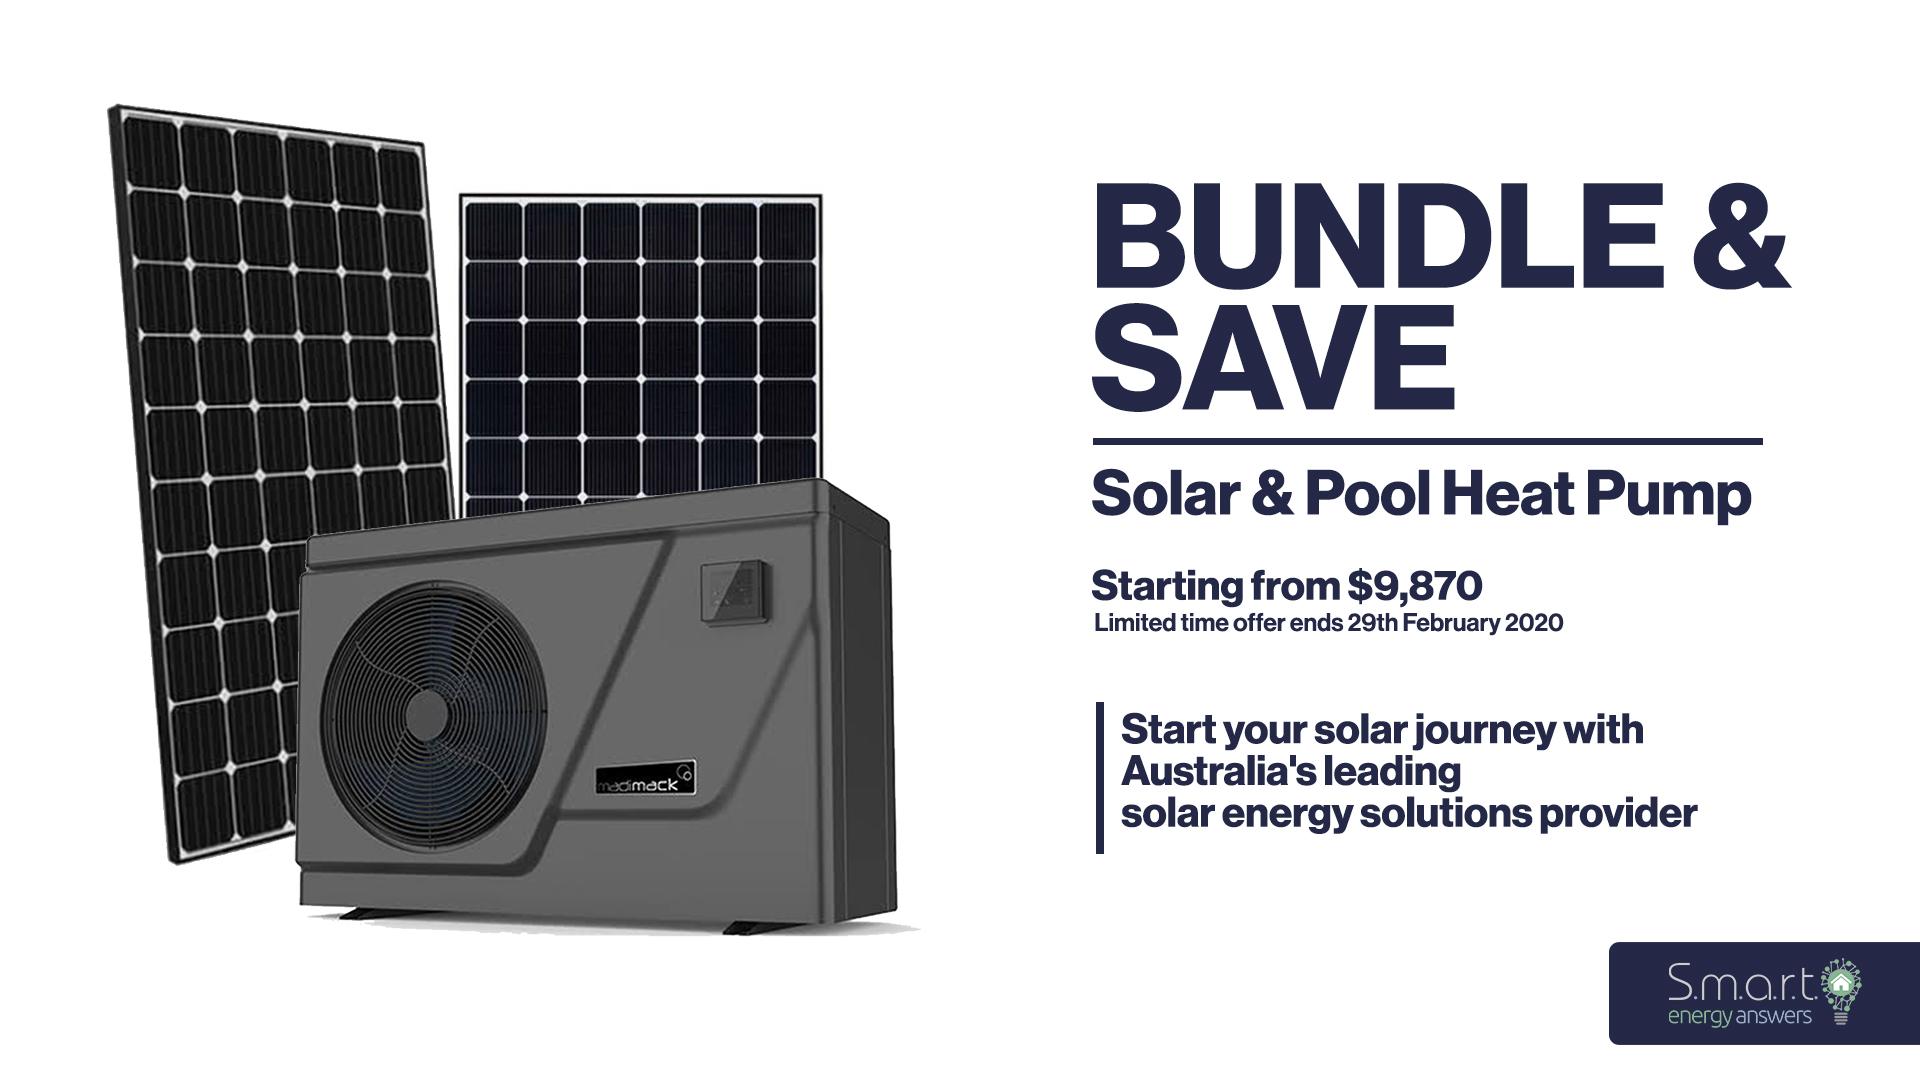 Bundle & Save: Solar & Pool Heat Pump - featured image